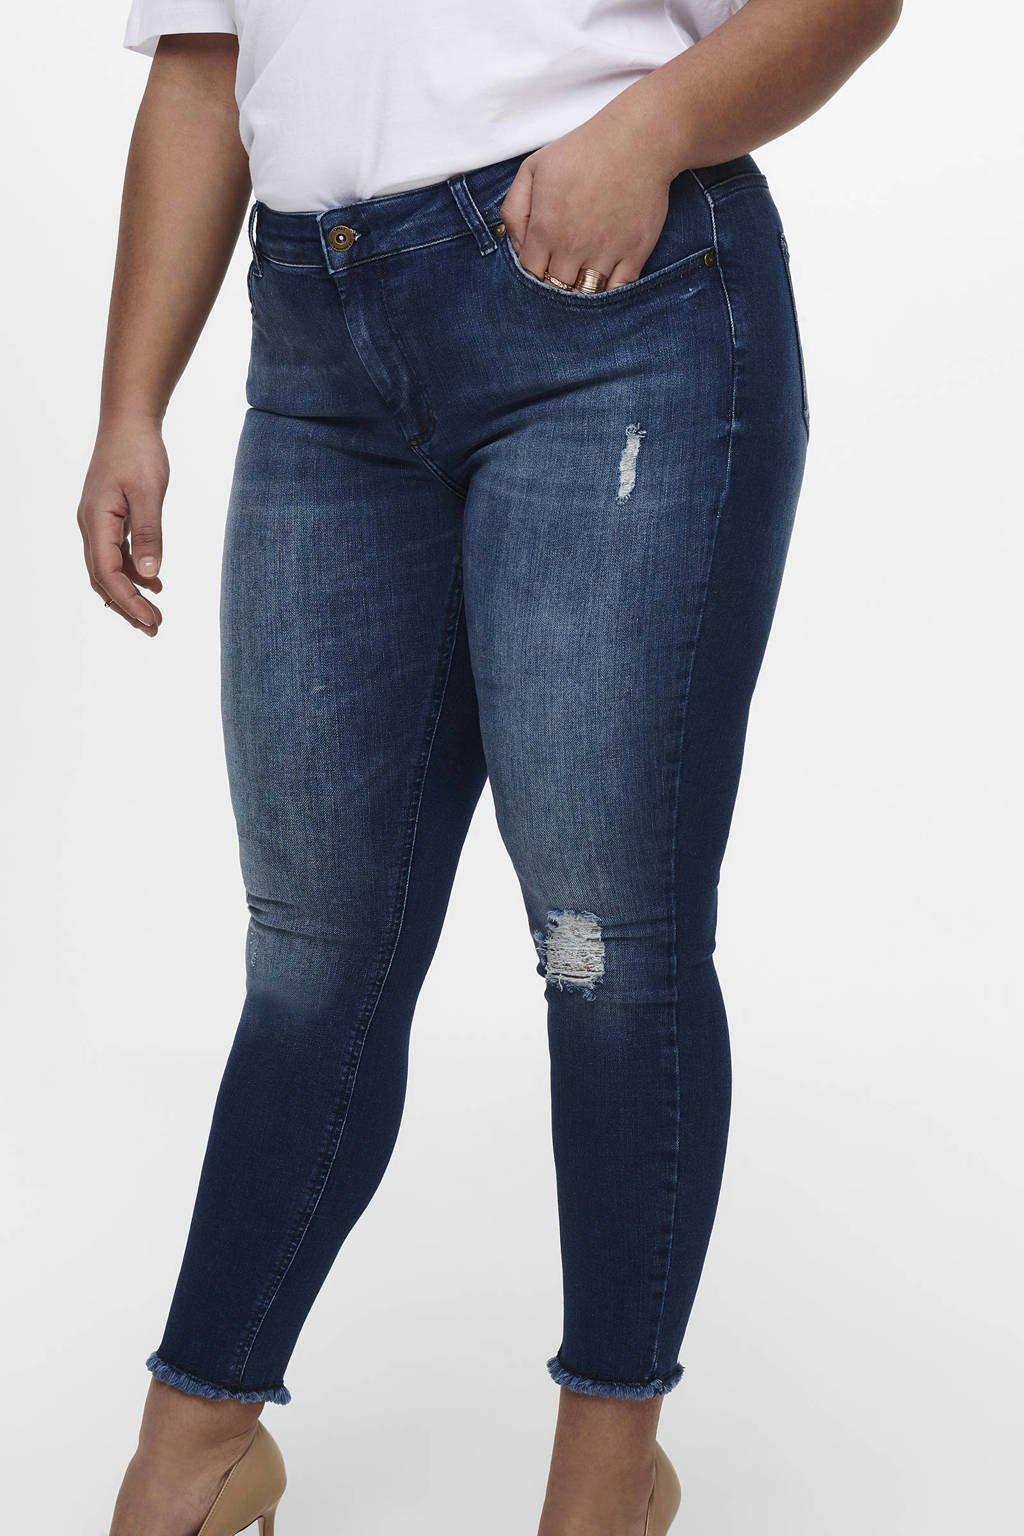 ONLY CARMAKOMA jeans met slijtage details, Blauw denim